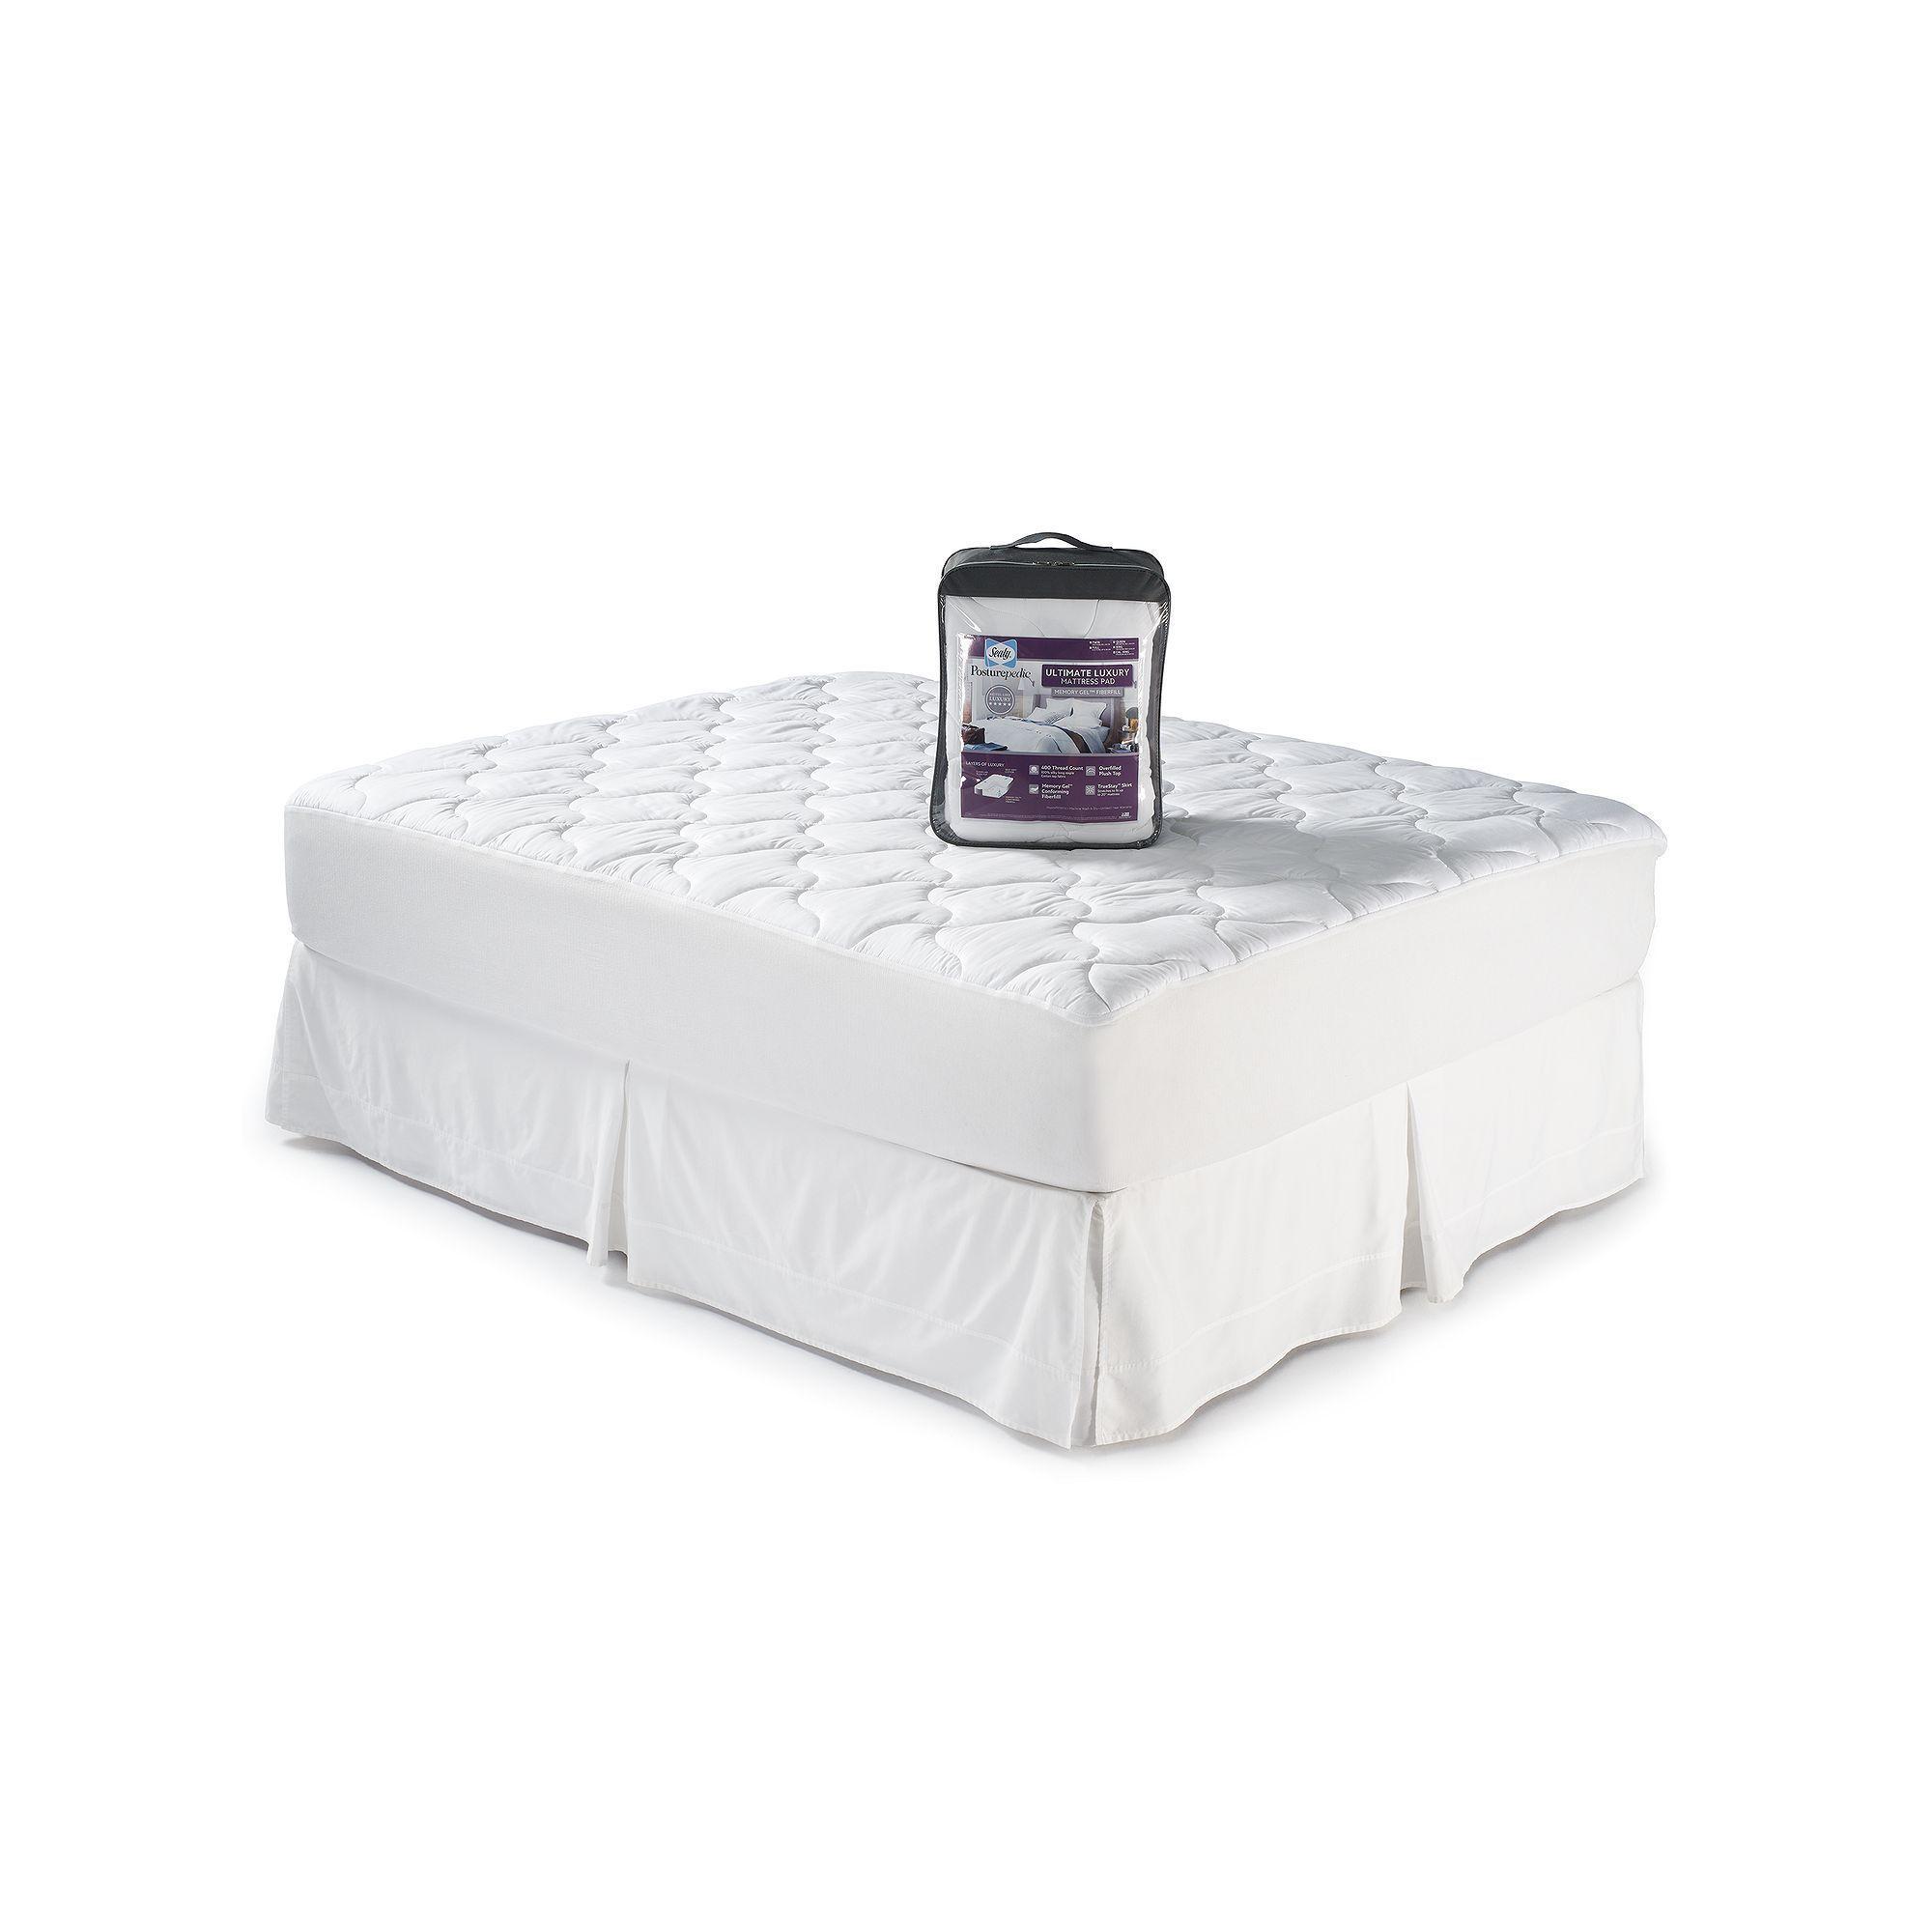 sealy elite ultimate luxury cotton mattress pad white mattress